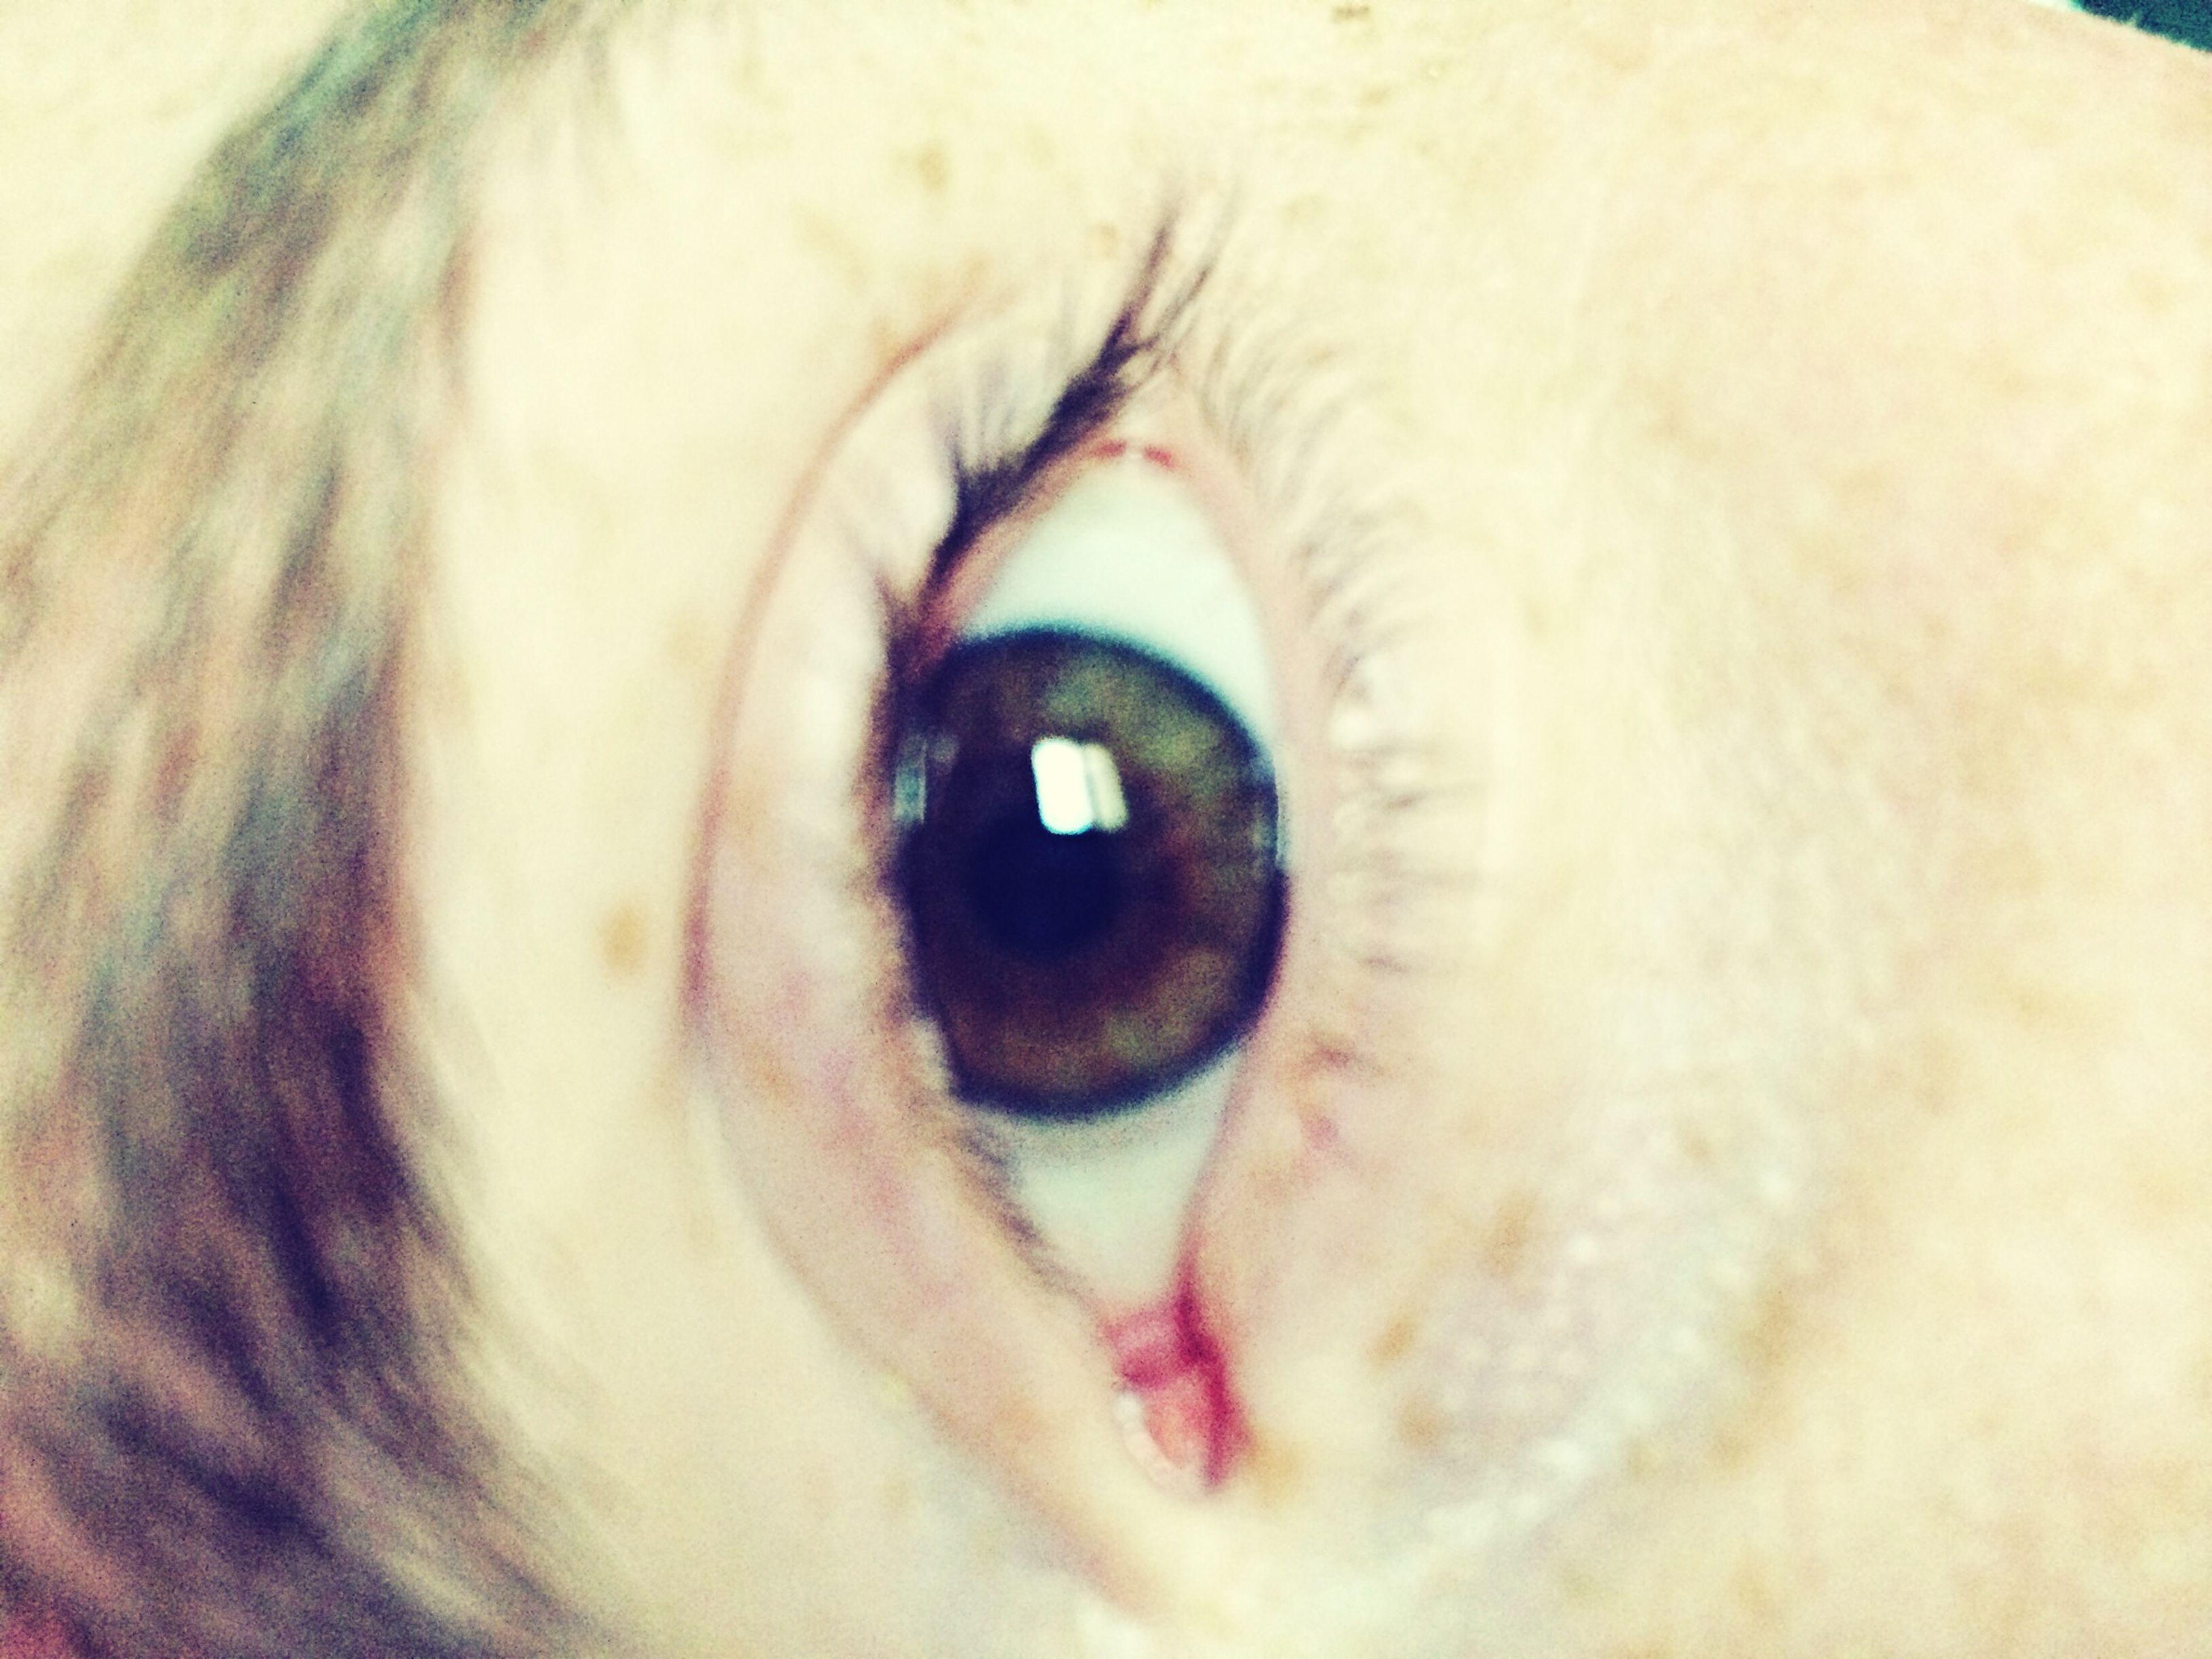 close-up, human eye, eyesight, portrait, looking at camera, part of, eyelash, sensory perception, indoors, extreme close-up, eyeball, pets, extreme close up, one animal, iris - eye, unrecognizable person, animal eye